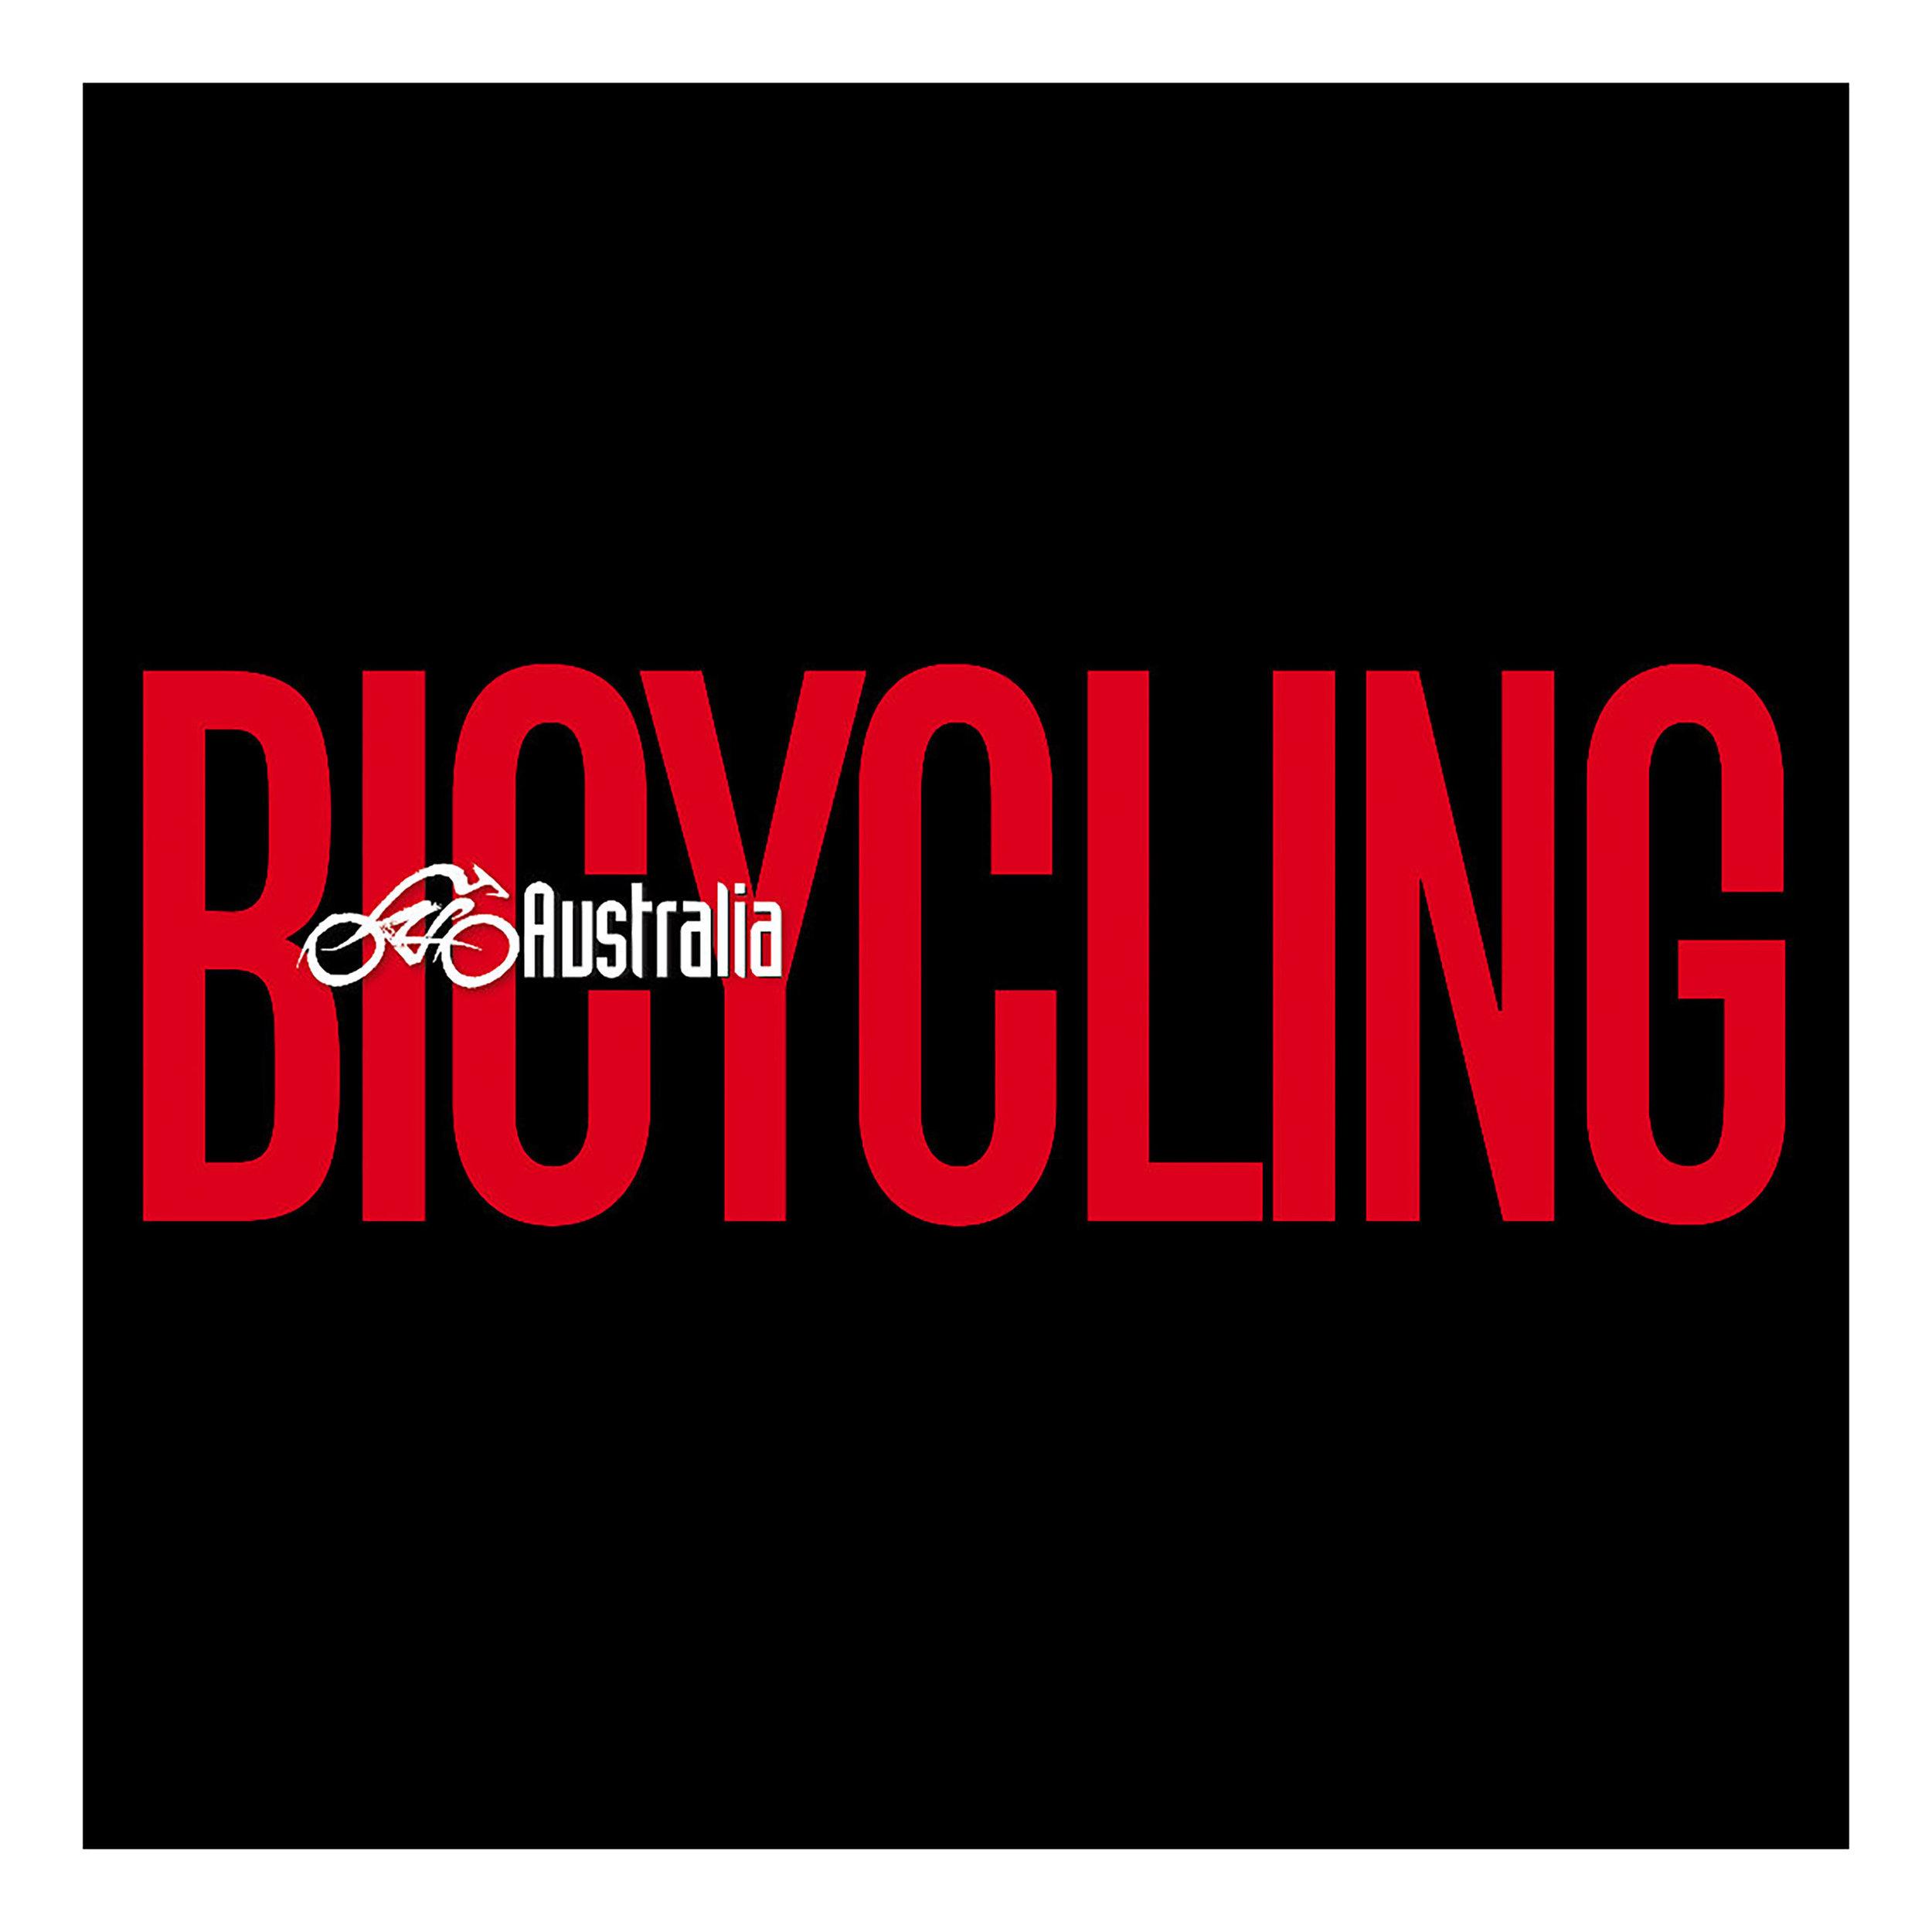 bicycling australia.jpg